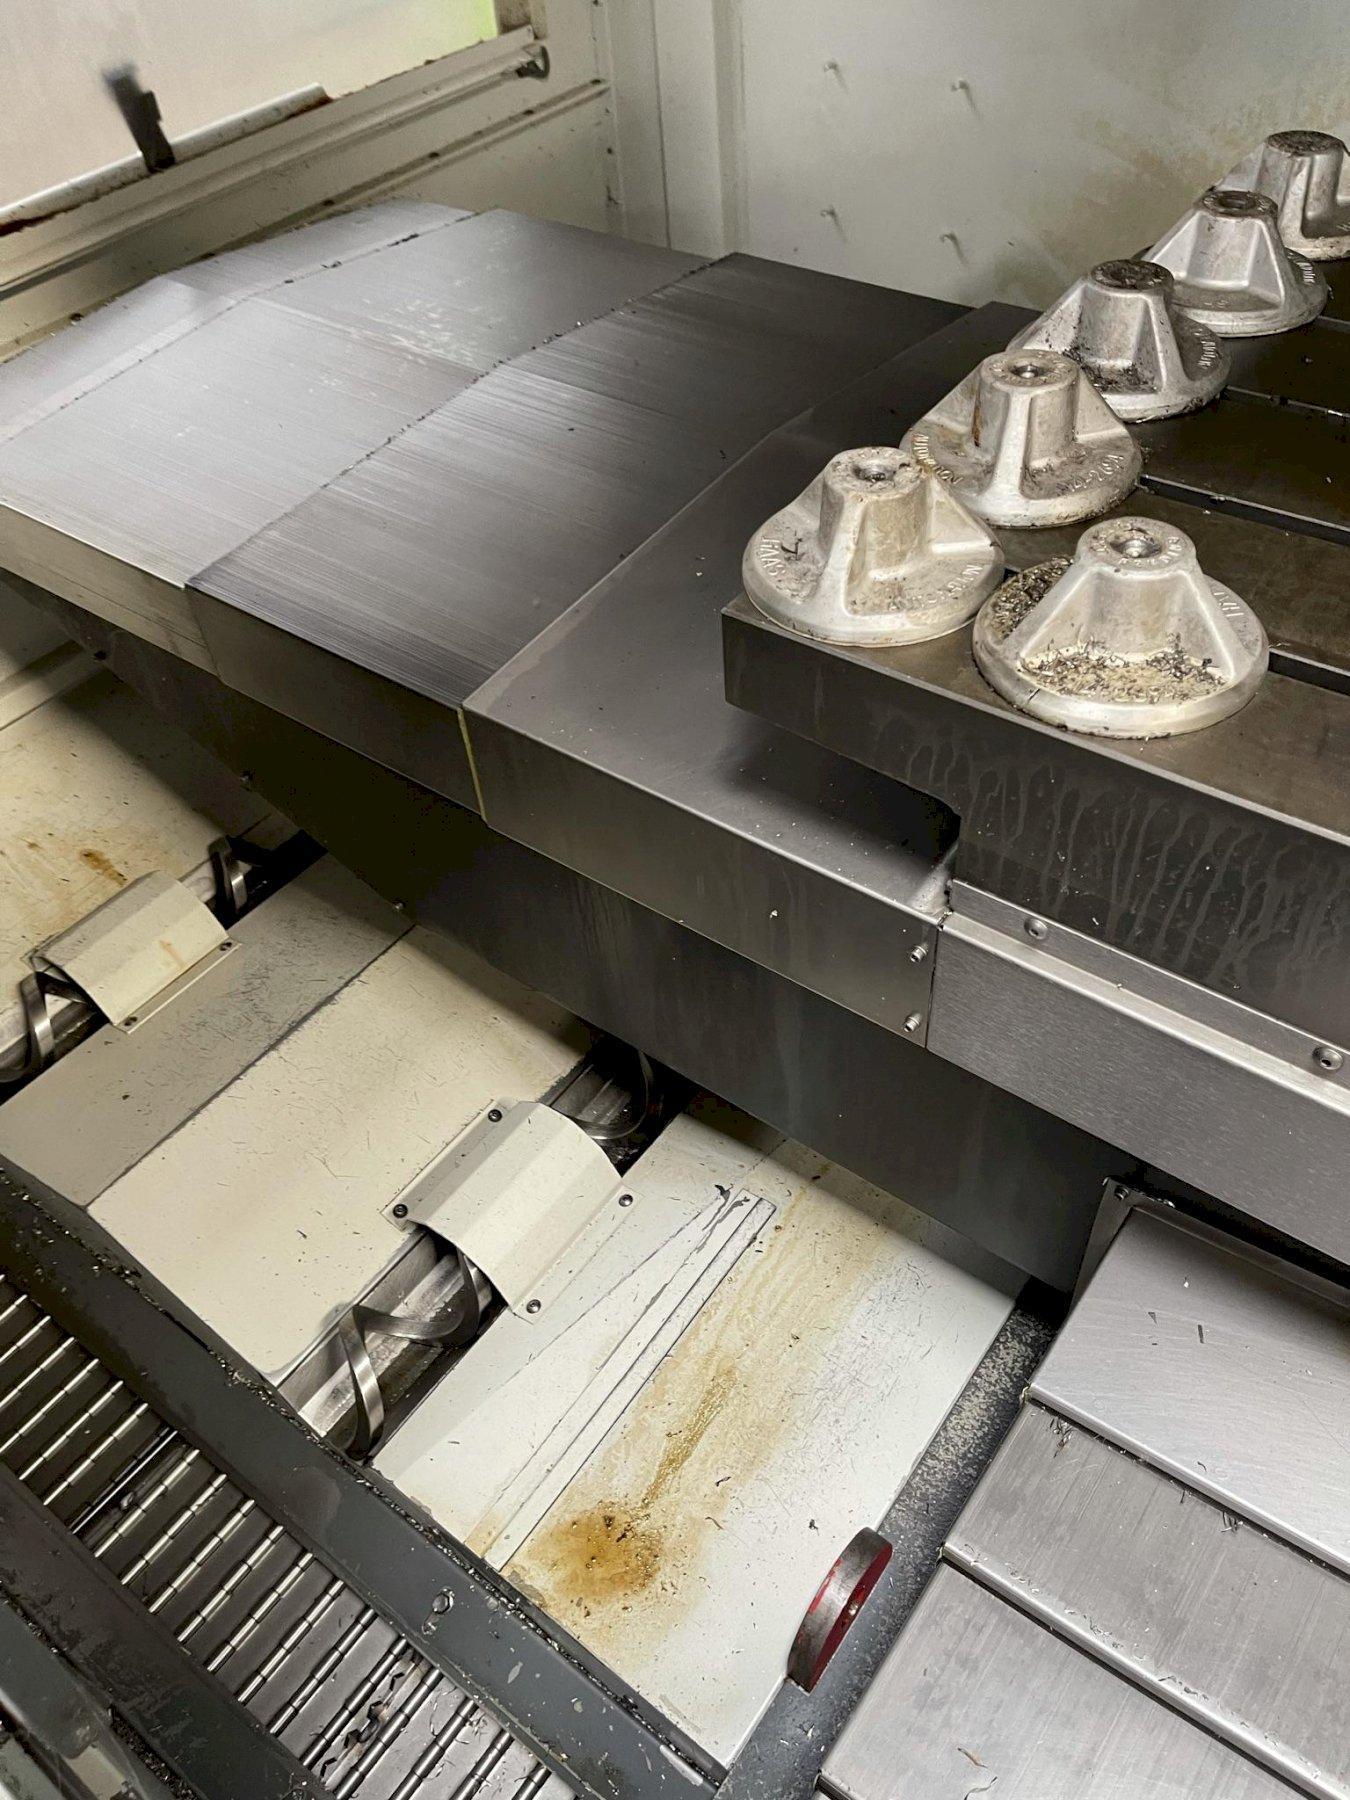 HAAS2014 Haas VF-6/50 Vertical Machining Center